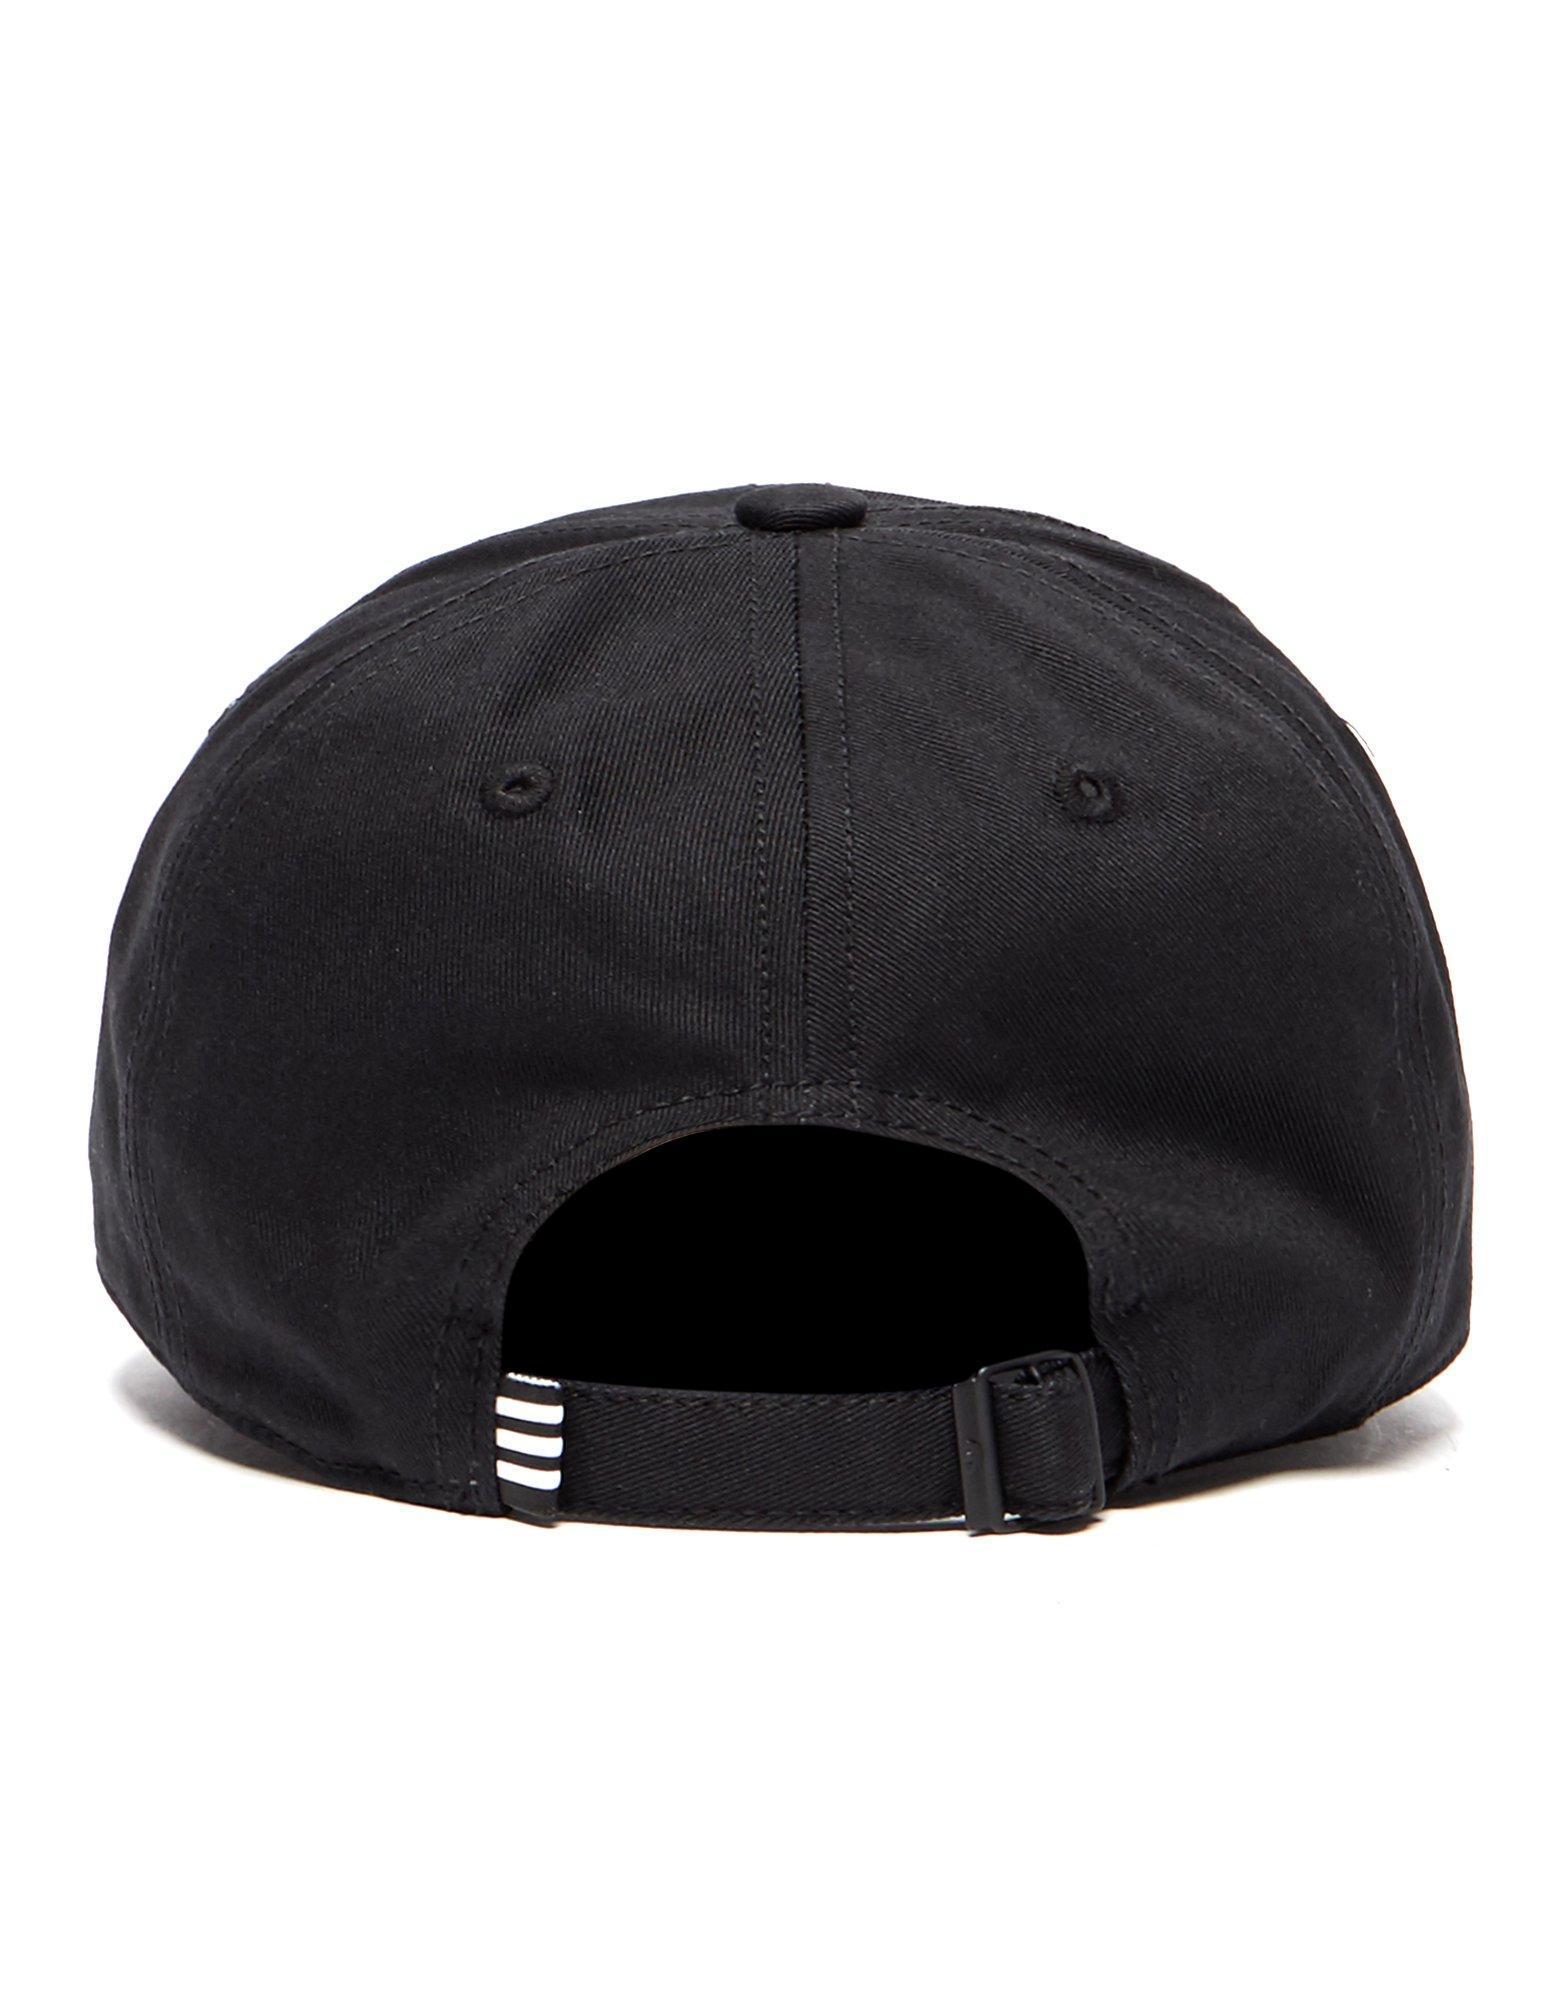 d35677d0251 Lyst - adidas Originals Trefoil Classic Cap in Black for Men